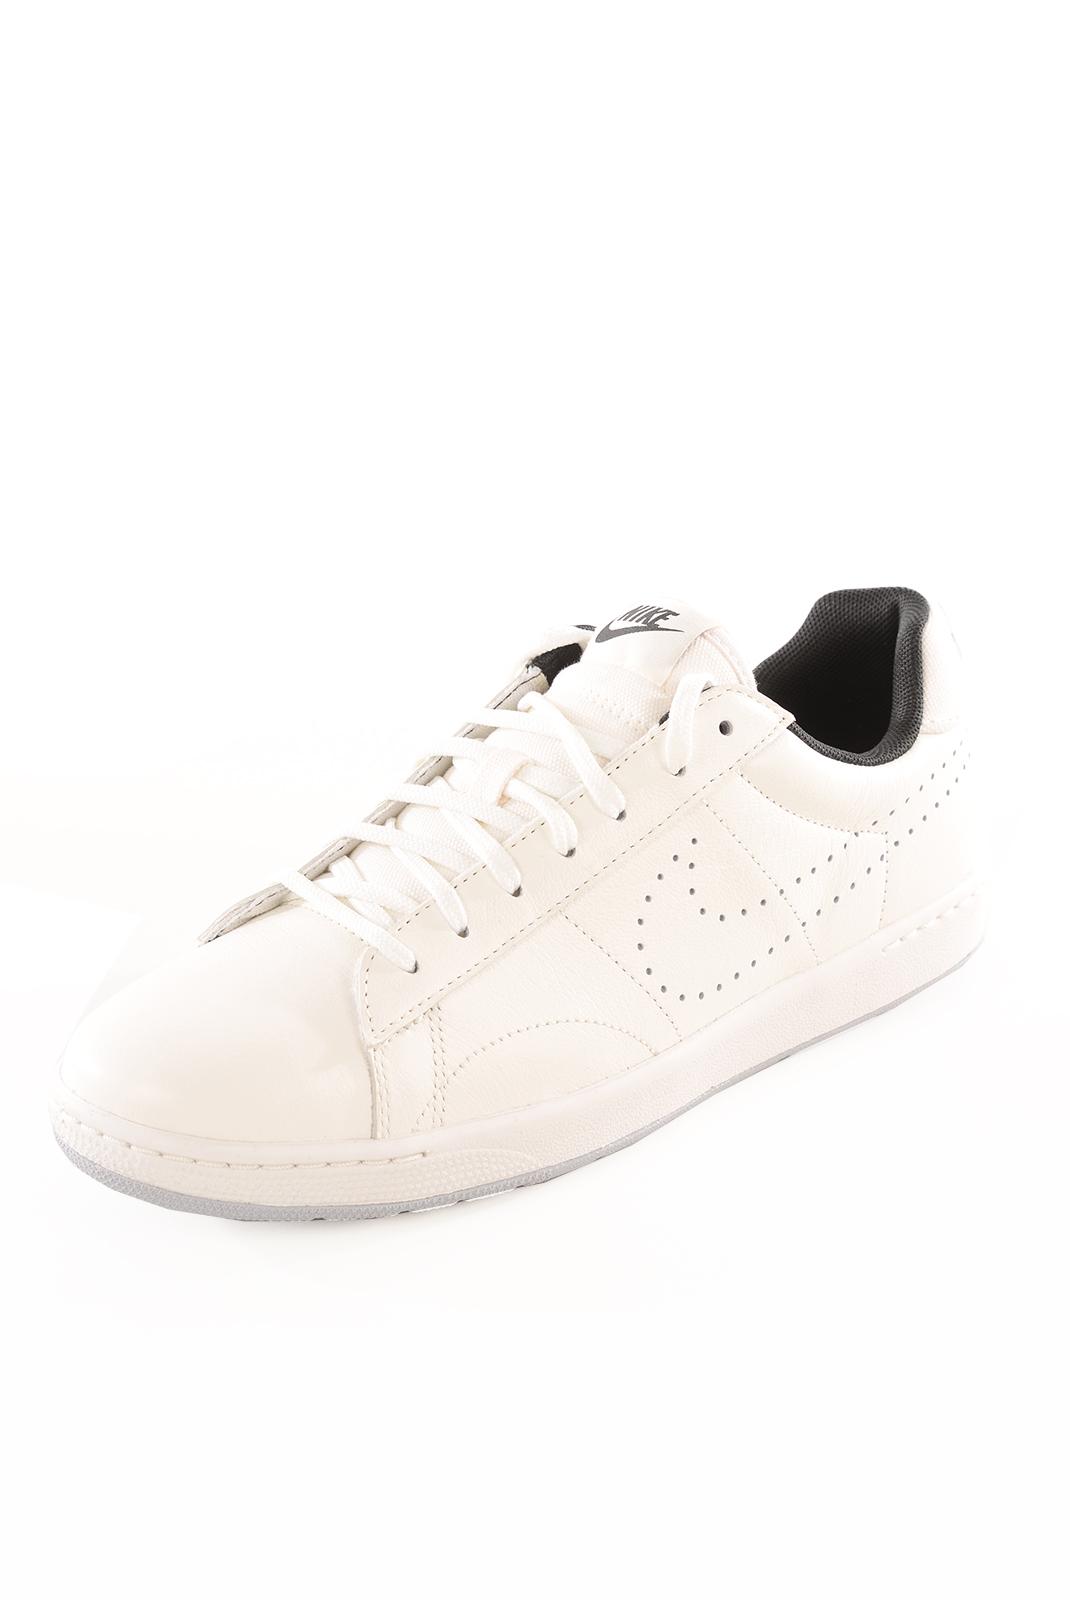 Chaussures   Nike 749644 TENNIS 100 NOIR IVOIRE